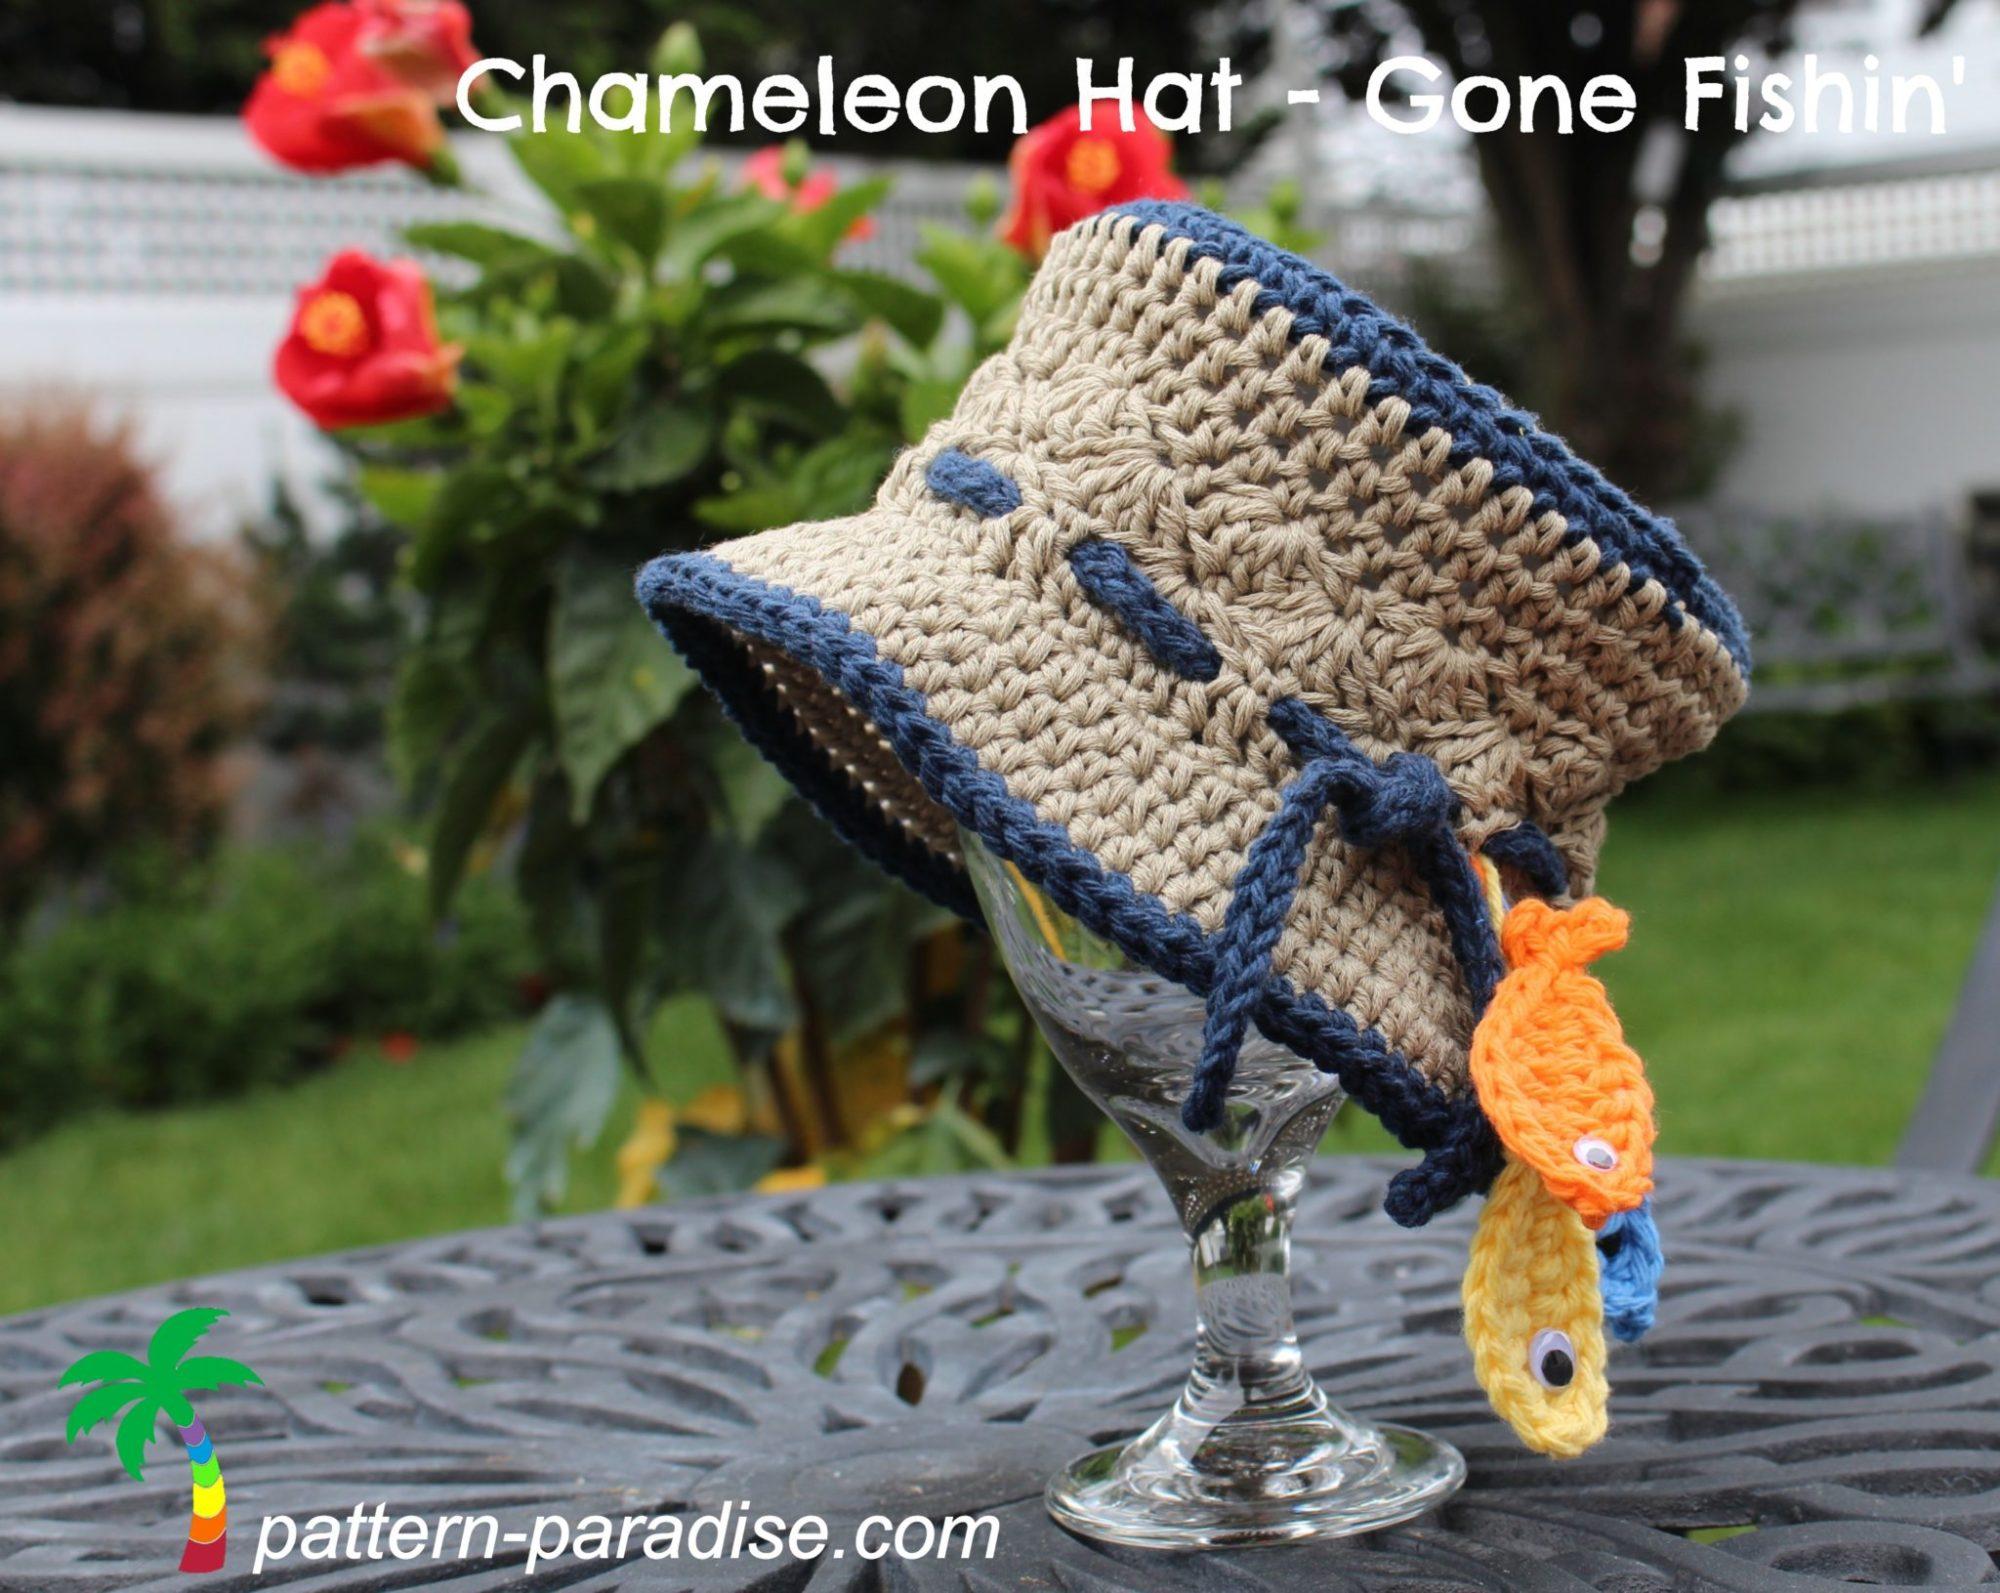 FREE Crochet Pattern - Chameleon Hat - Gone Fishin\' | Pattern Paradise